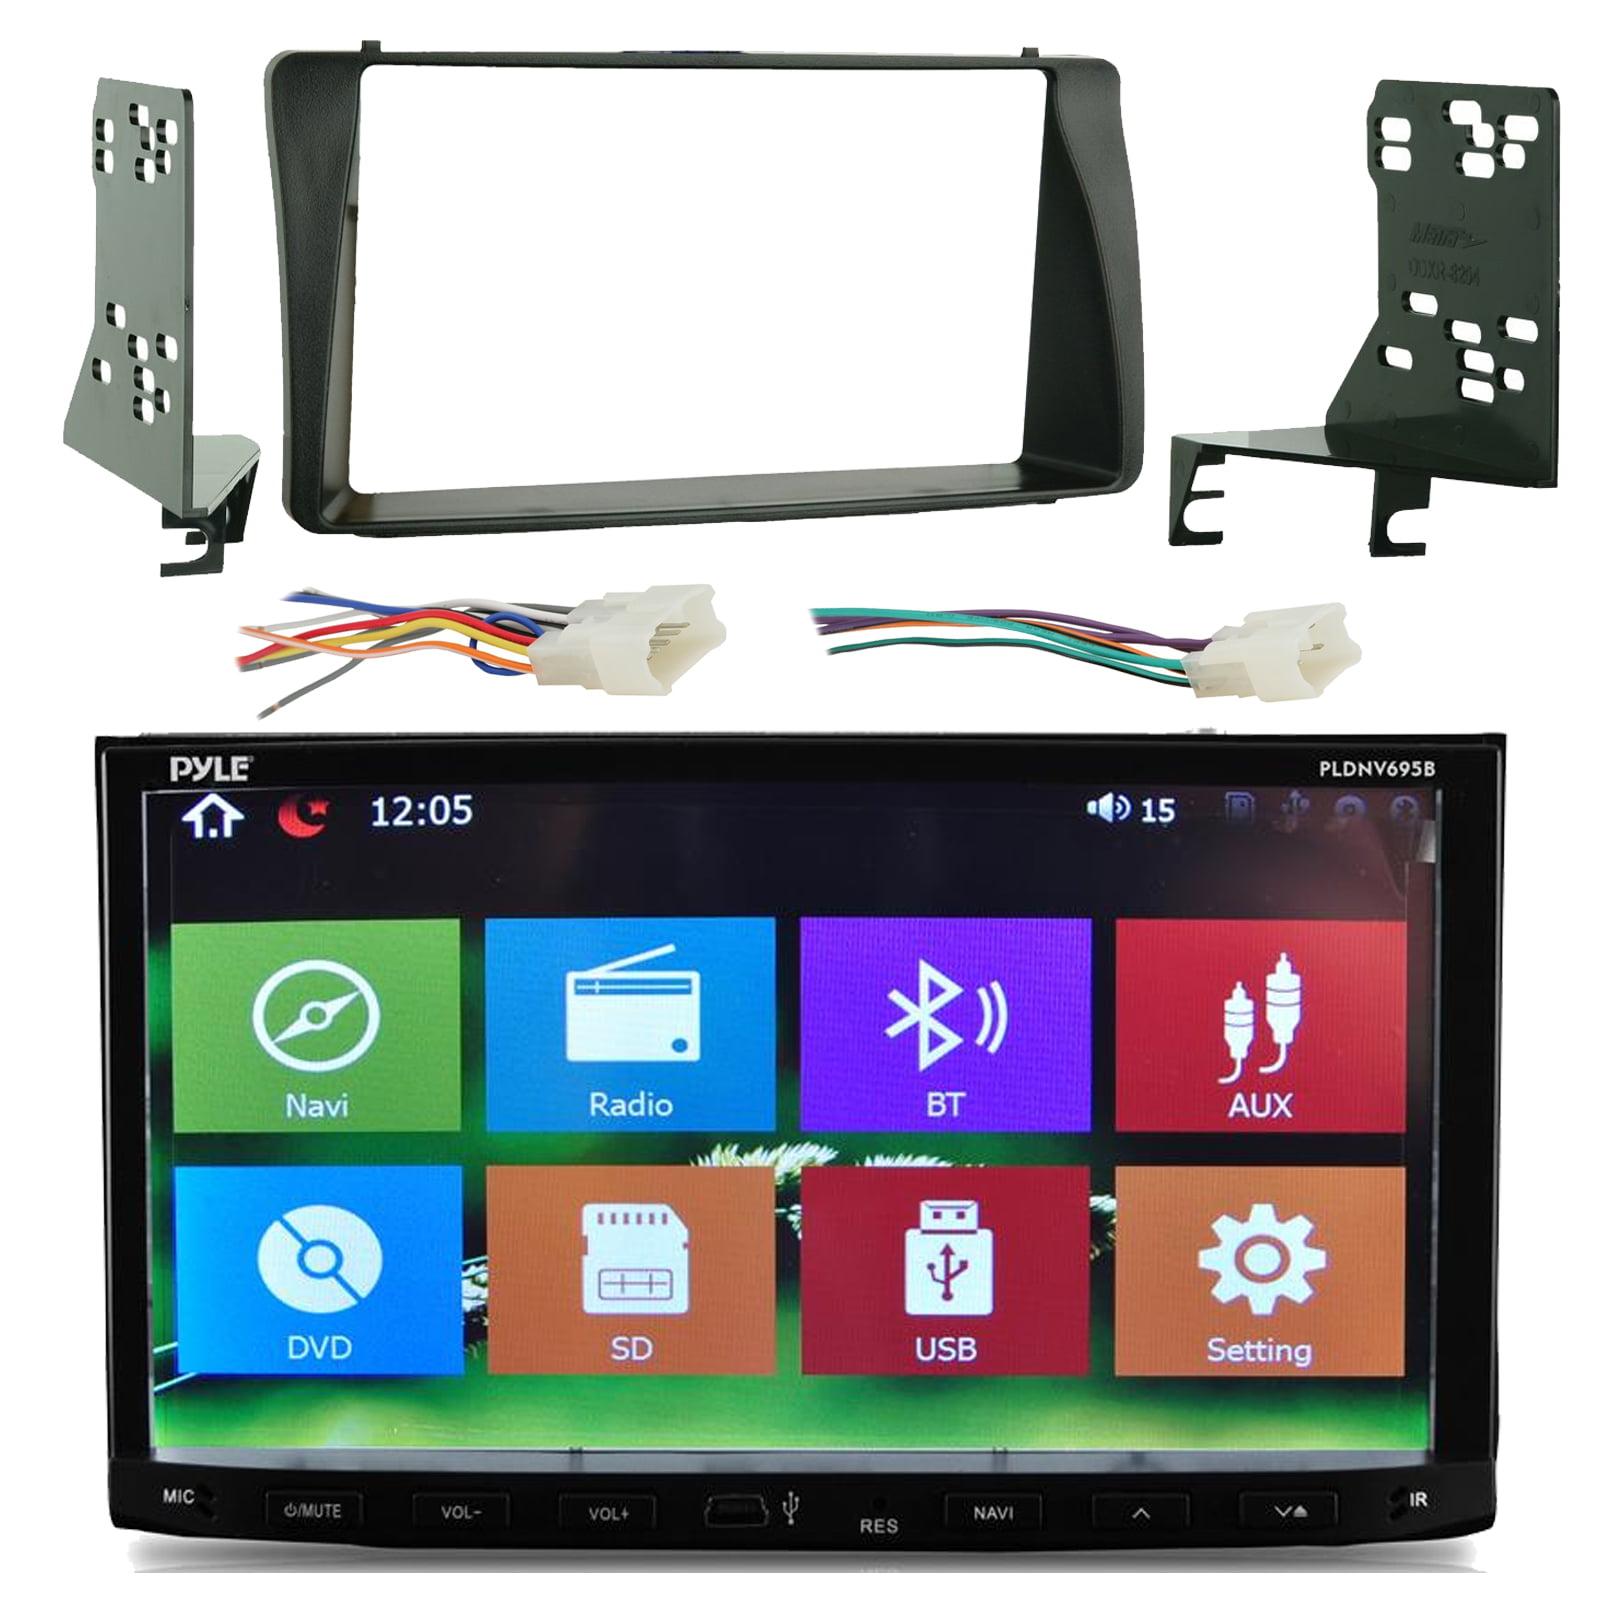 Pyle PLDNV695B 7'' Touch Screen Bluetooth CD/DVD Player G...